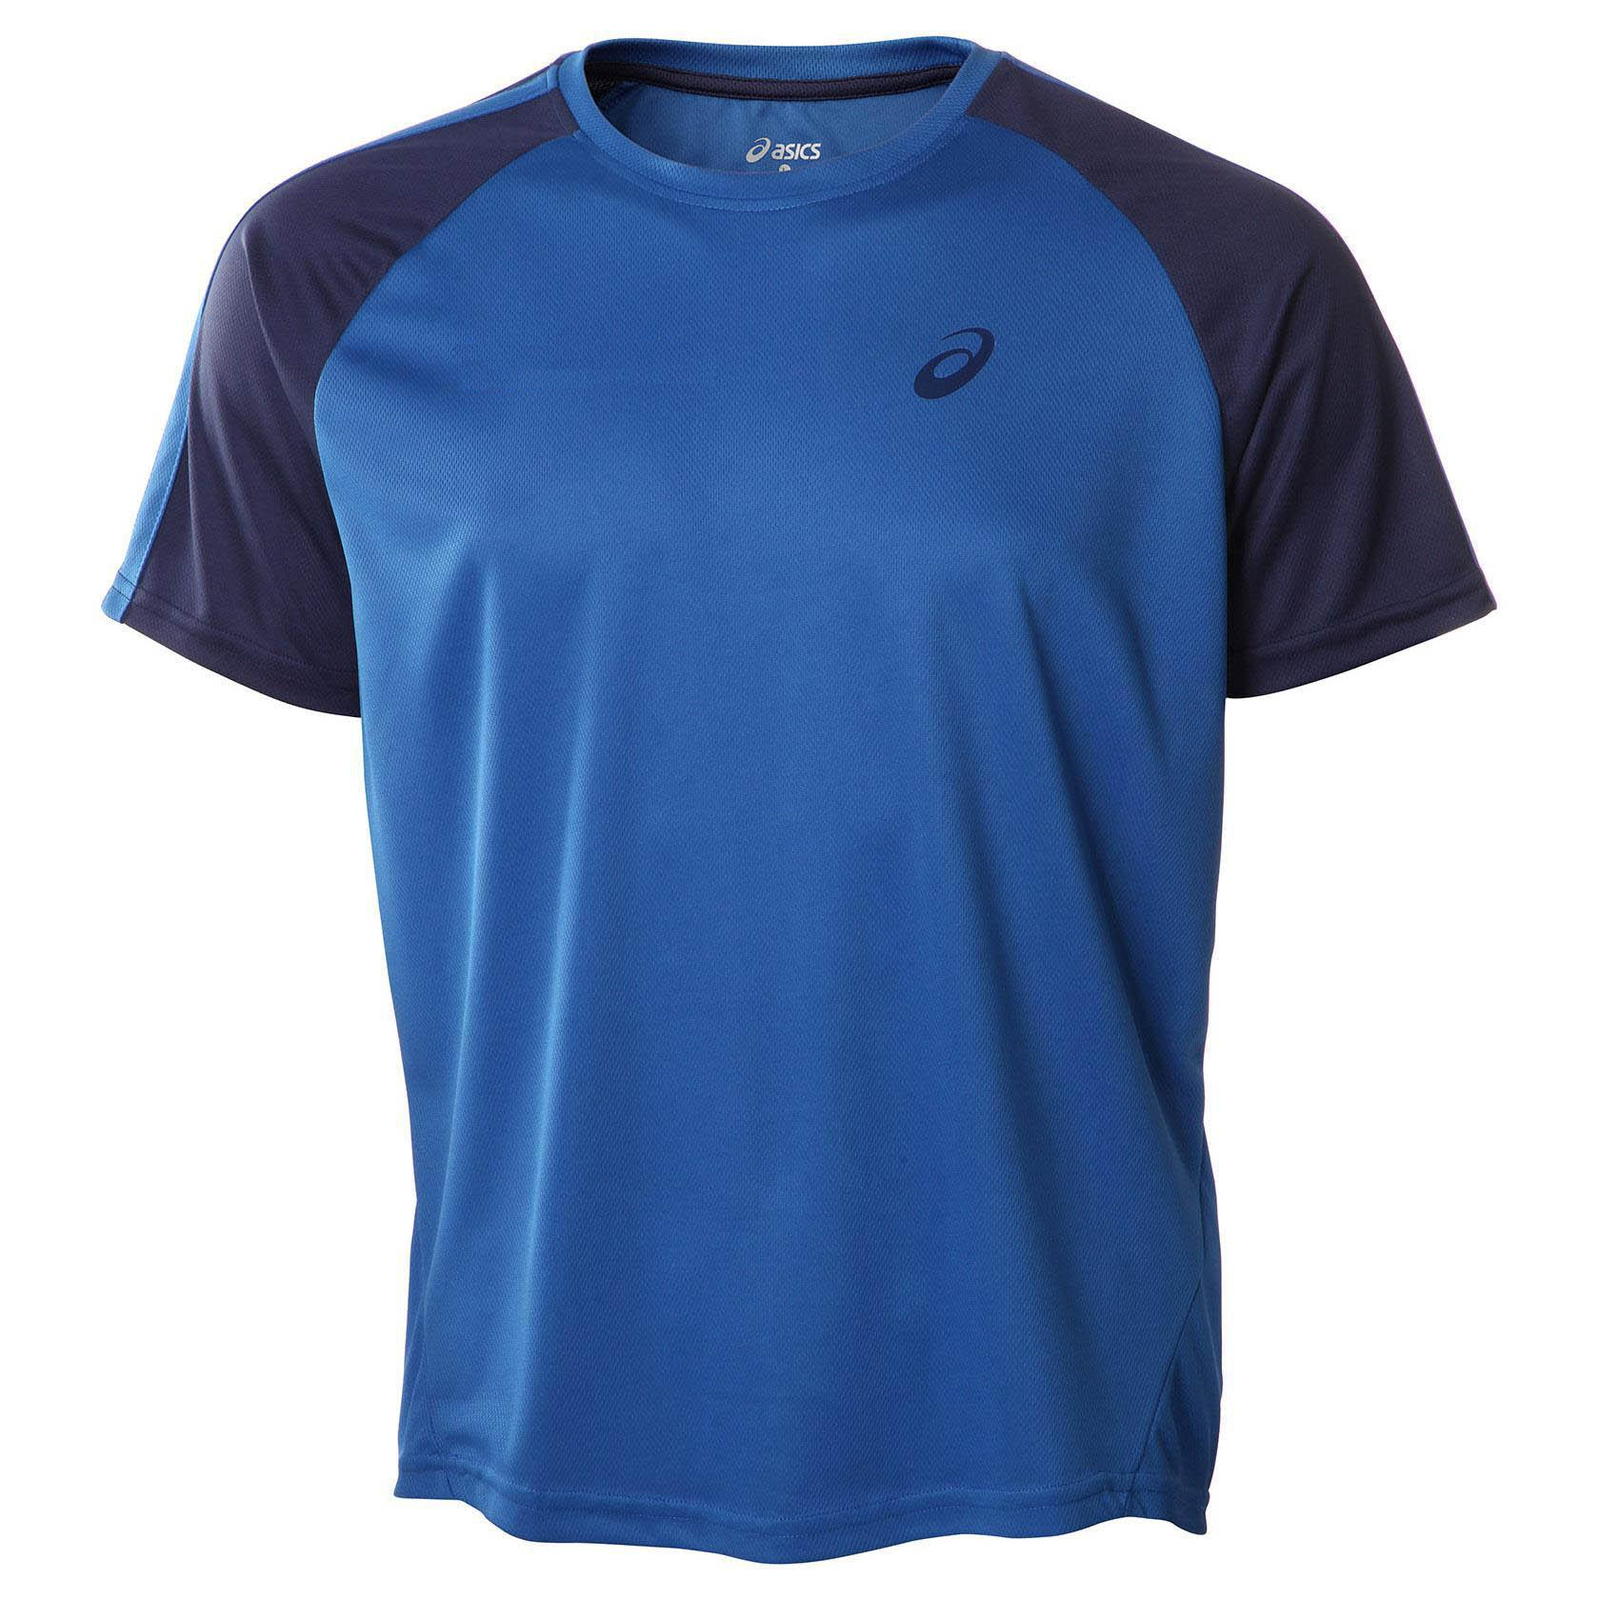 Asics Mens T-Shirt Colour Block T-Shirt - Imperial - New